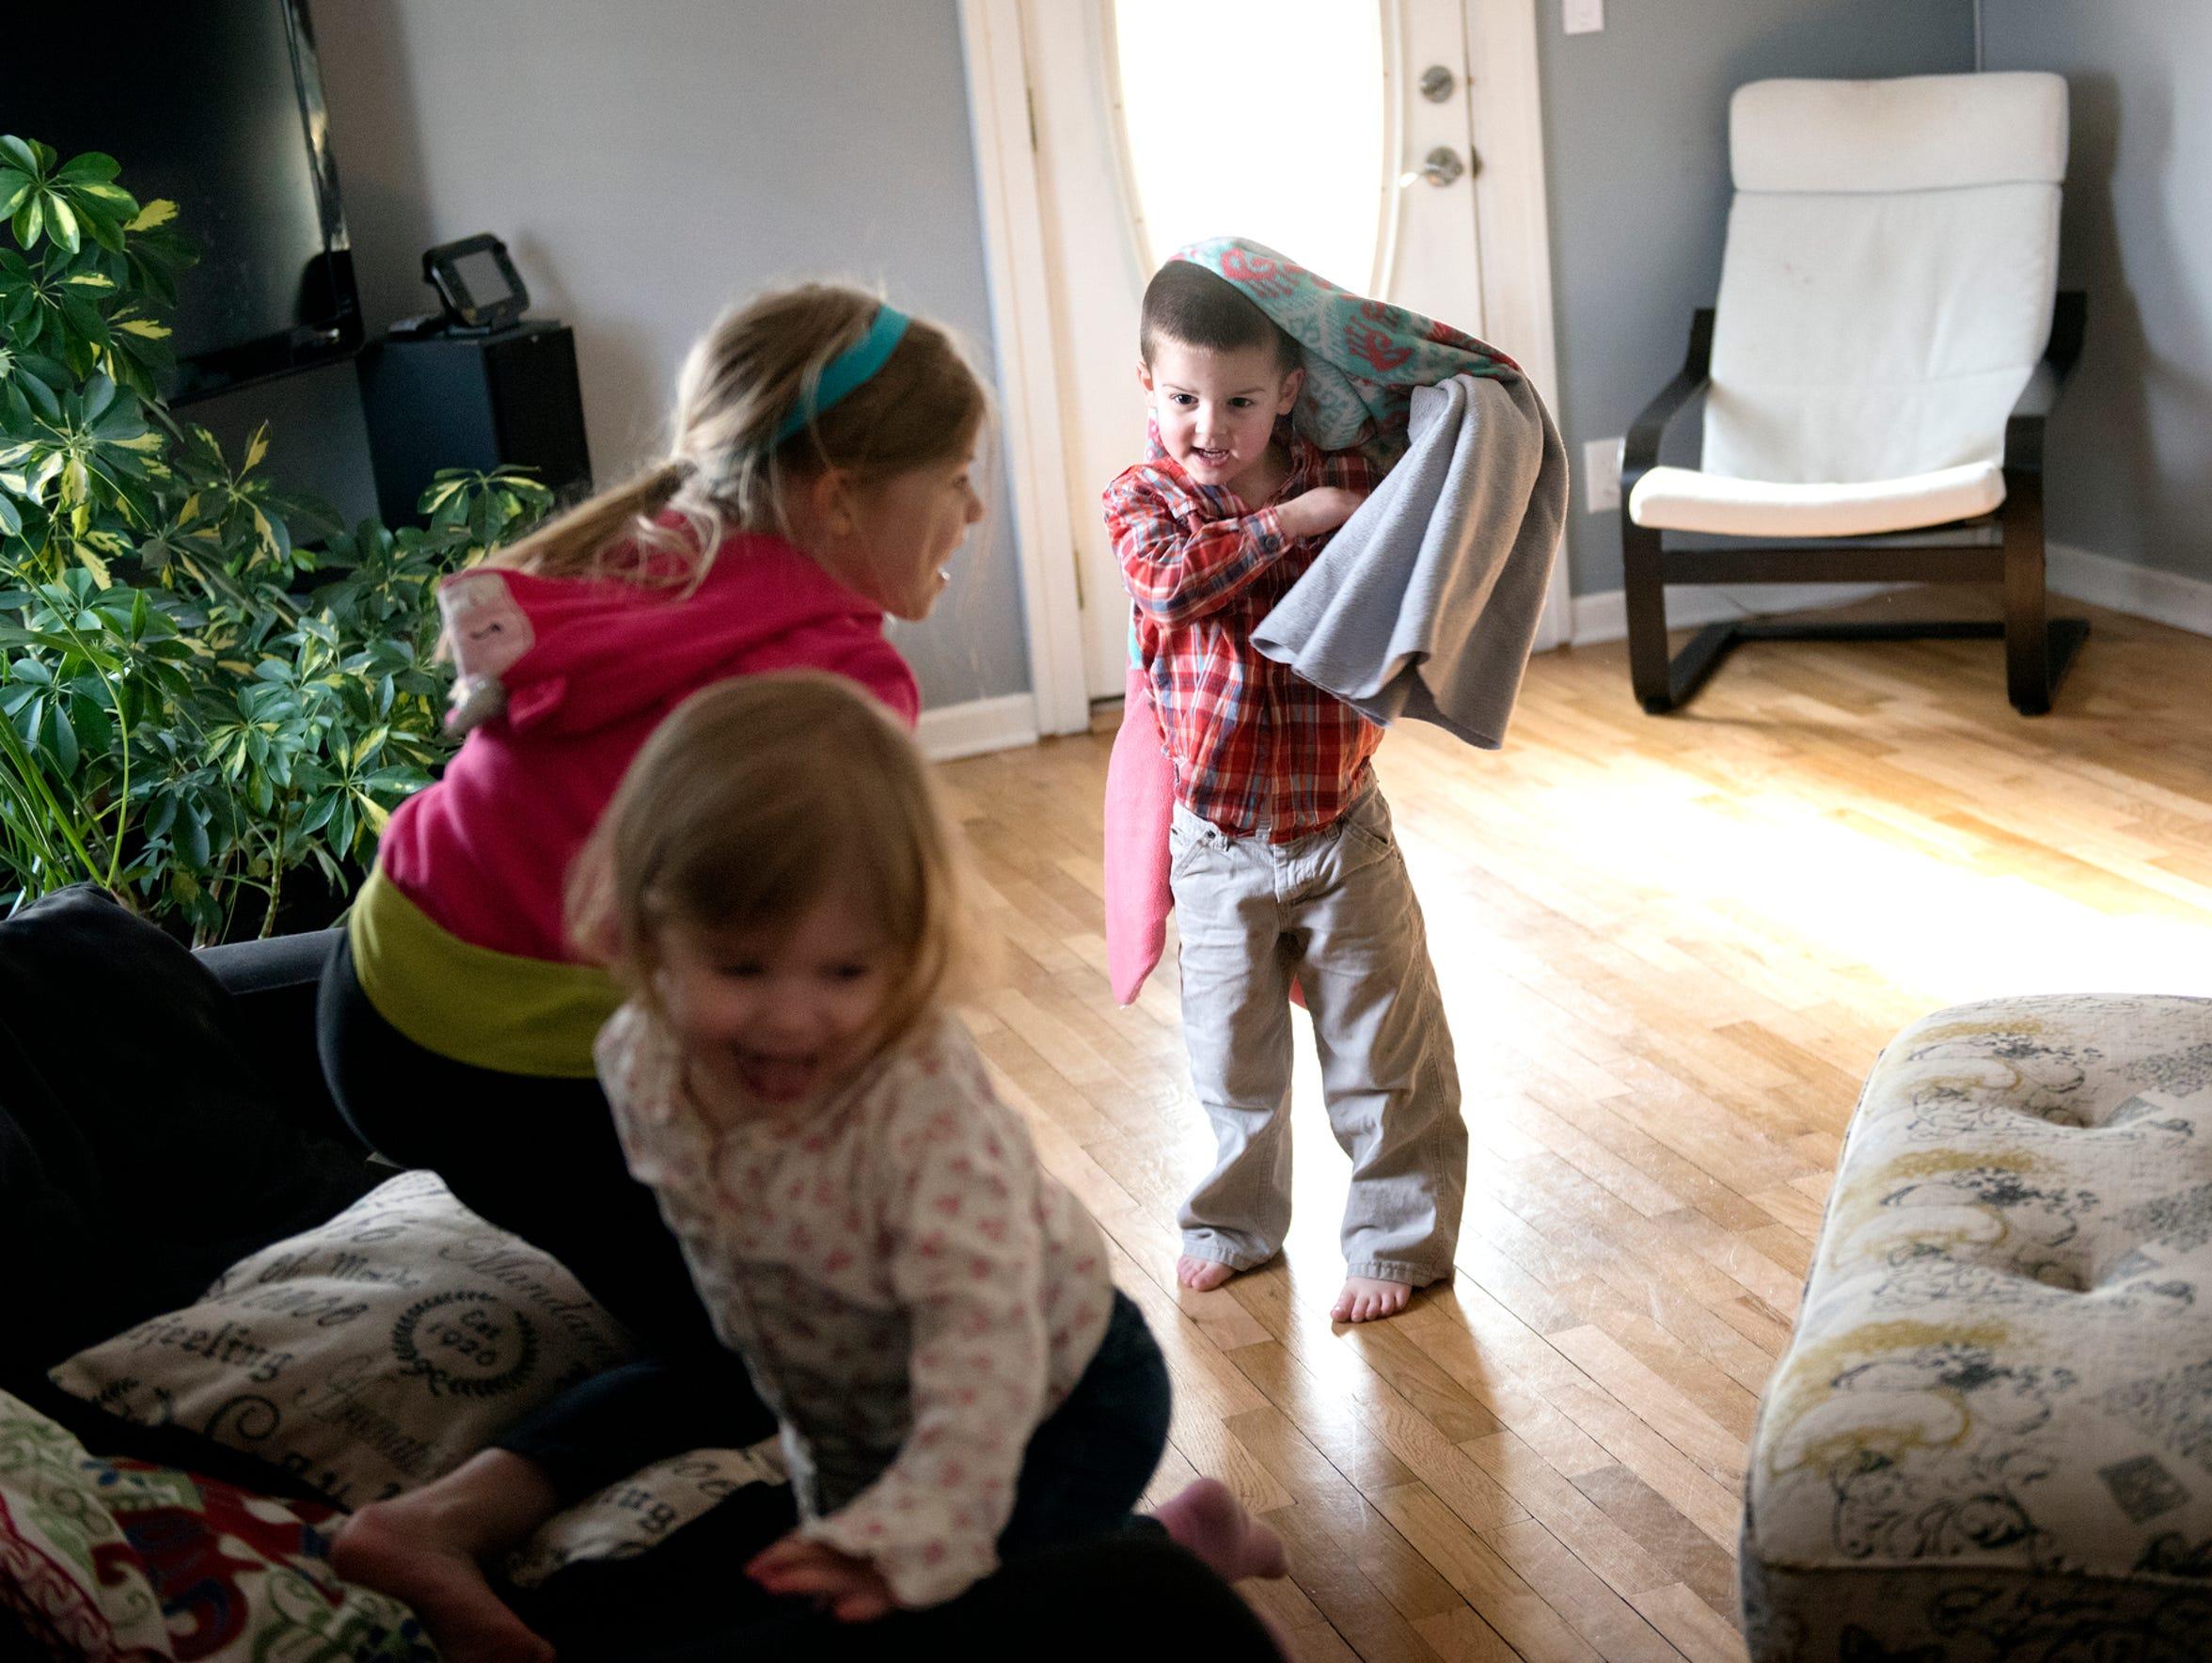 Simeon Neuenschwander, 4, right, pulls a blanket off